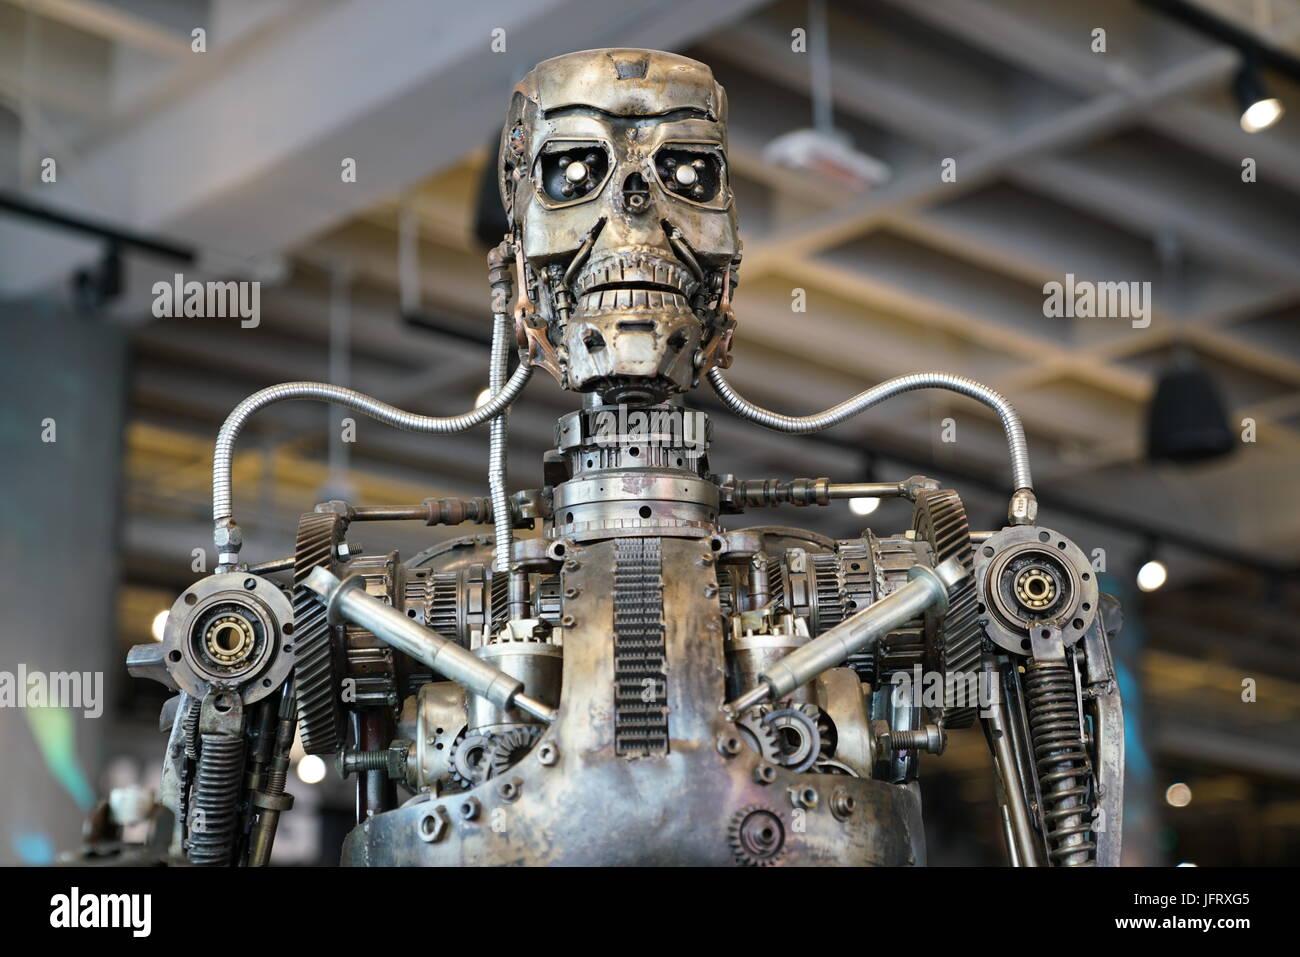 Los Angeles, California, USA - JUNE 25, 2017: Cyberdyne Systems Model 101 Series T-800 Terminator metal endoskeleton - Stock Image